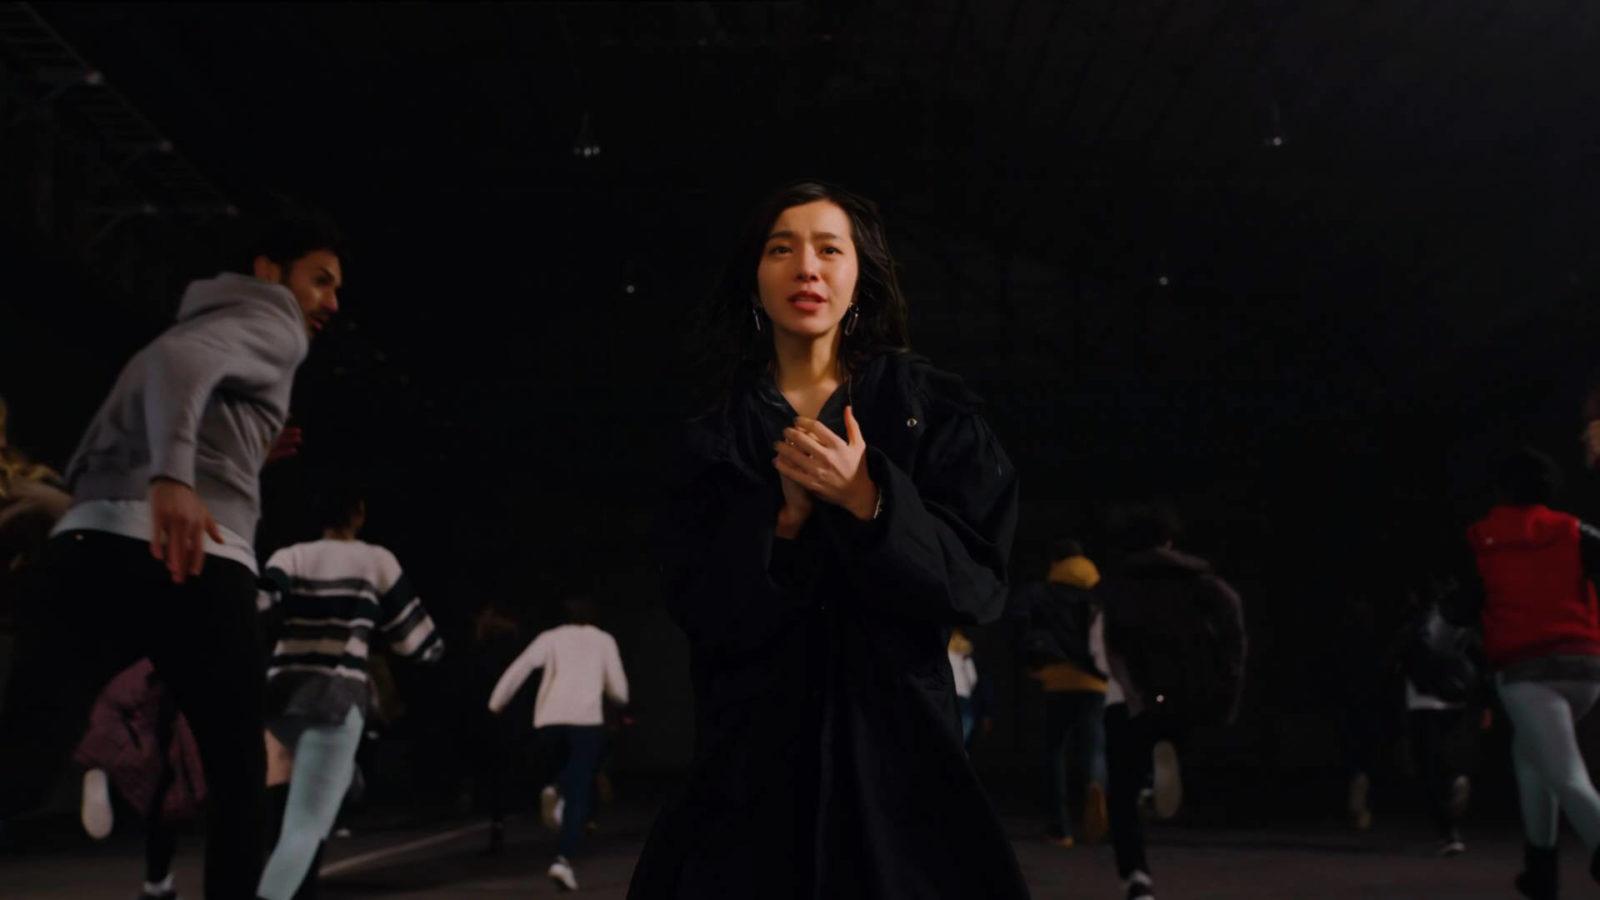 milet、ドラマ『スキャンダル専門弁護士 QUEEN』OPテーマ「inside you」MVを公開サムネイル画像